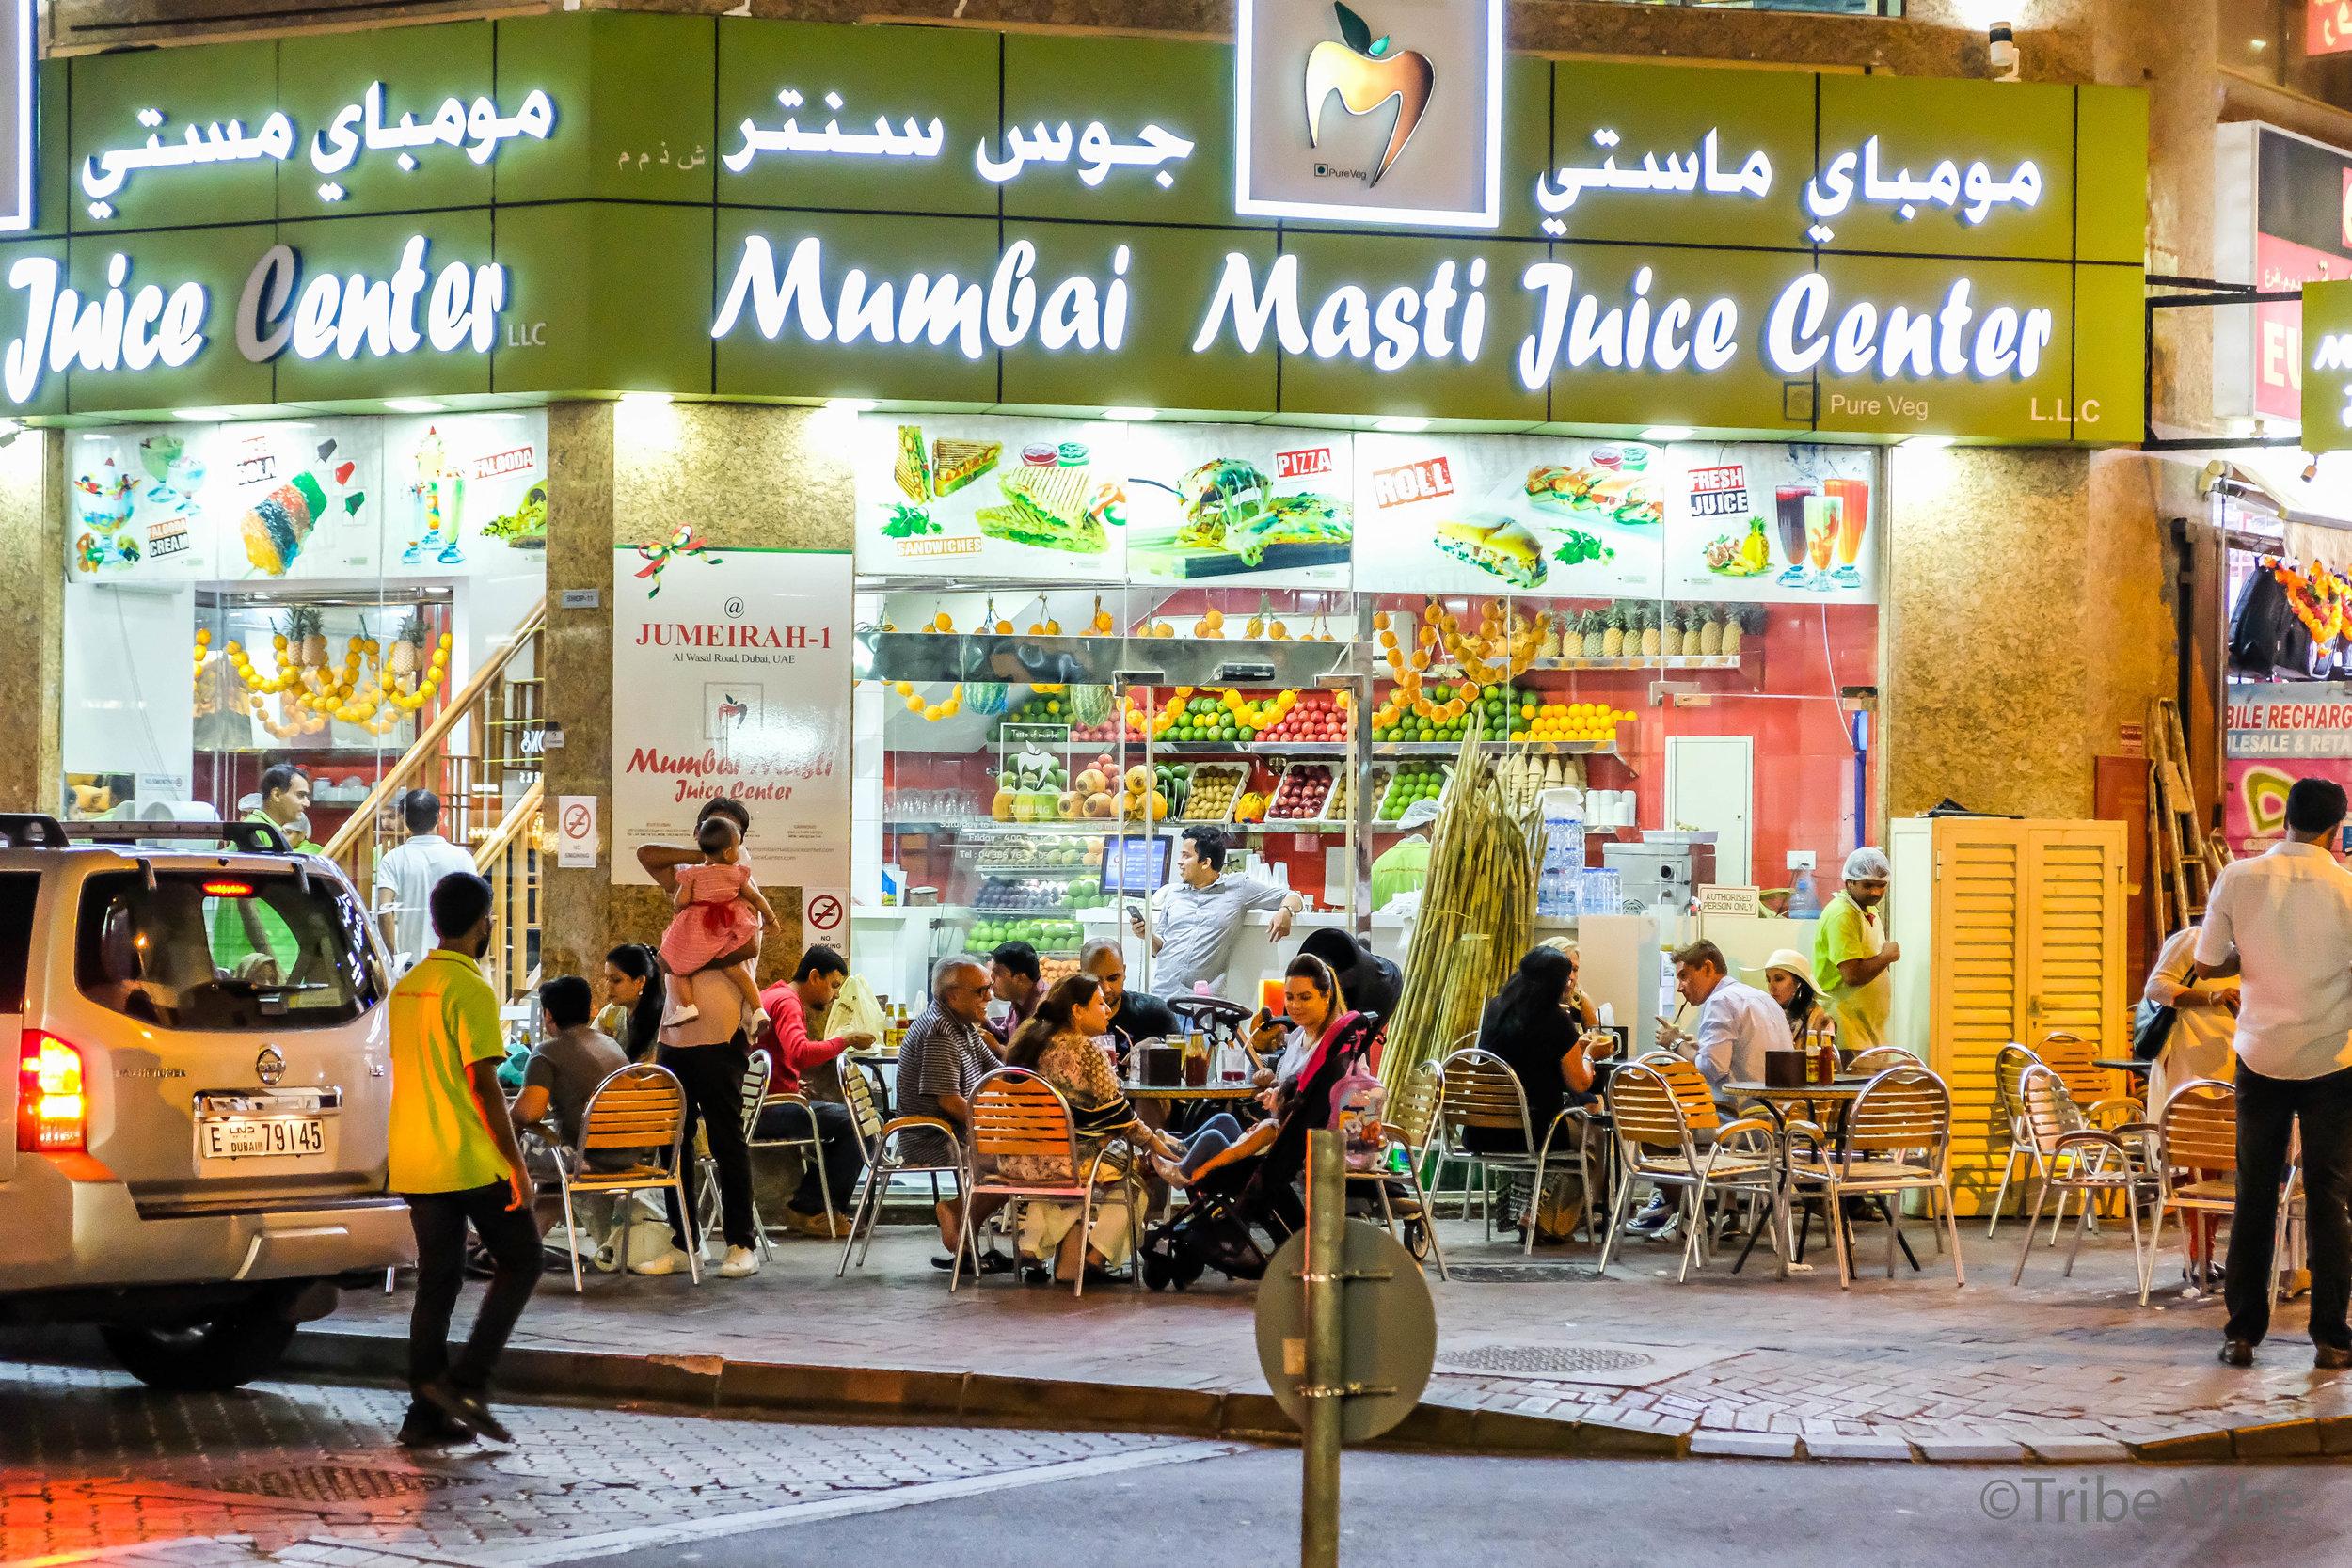 Mumbai Masti Restaurant in Bur Dubai